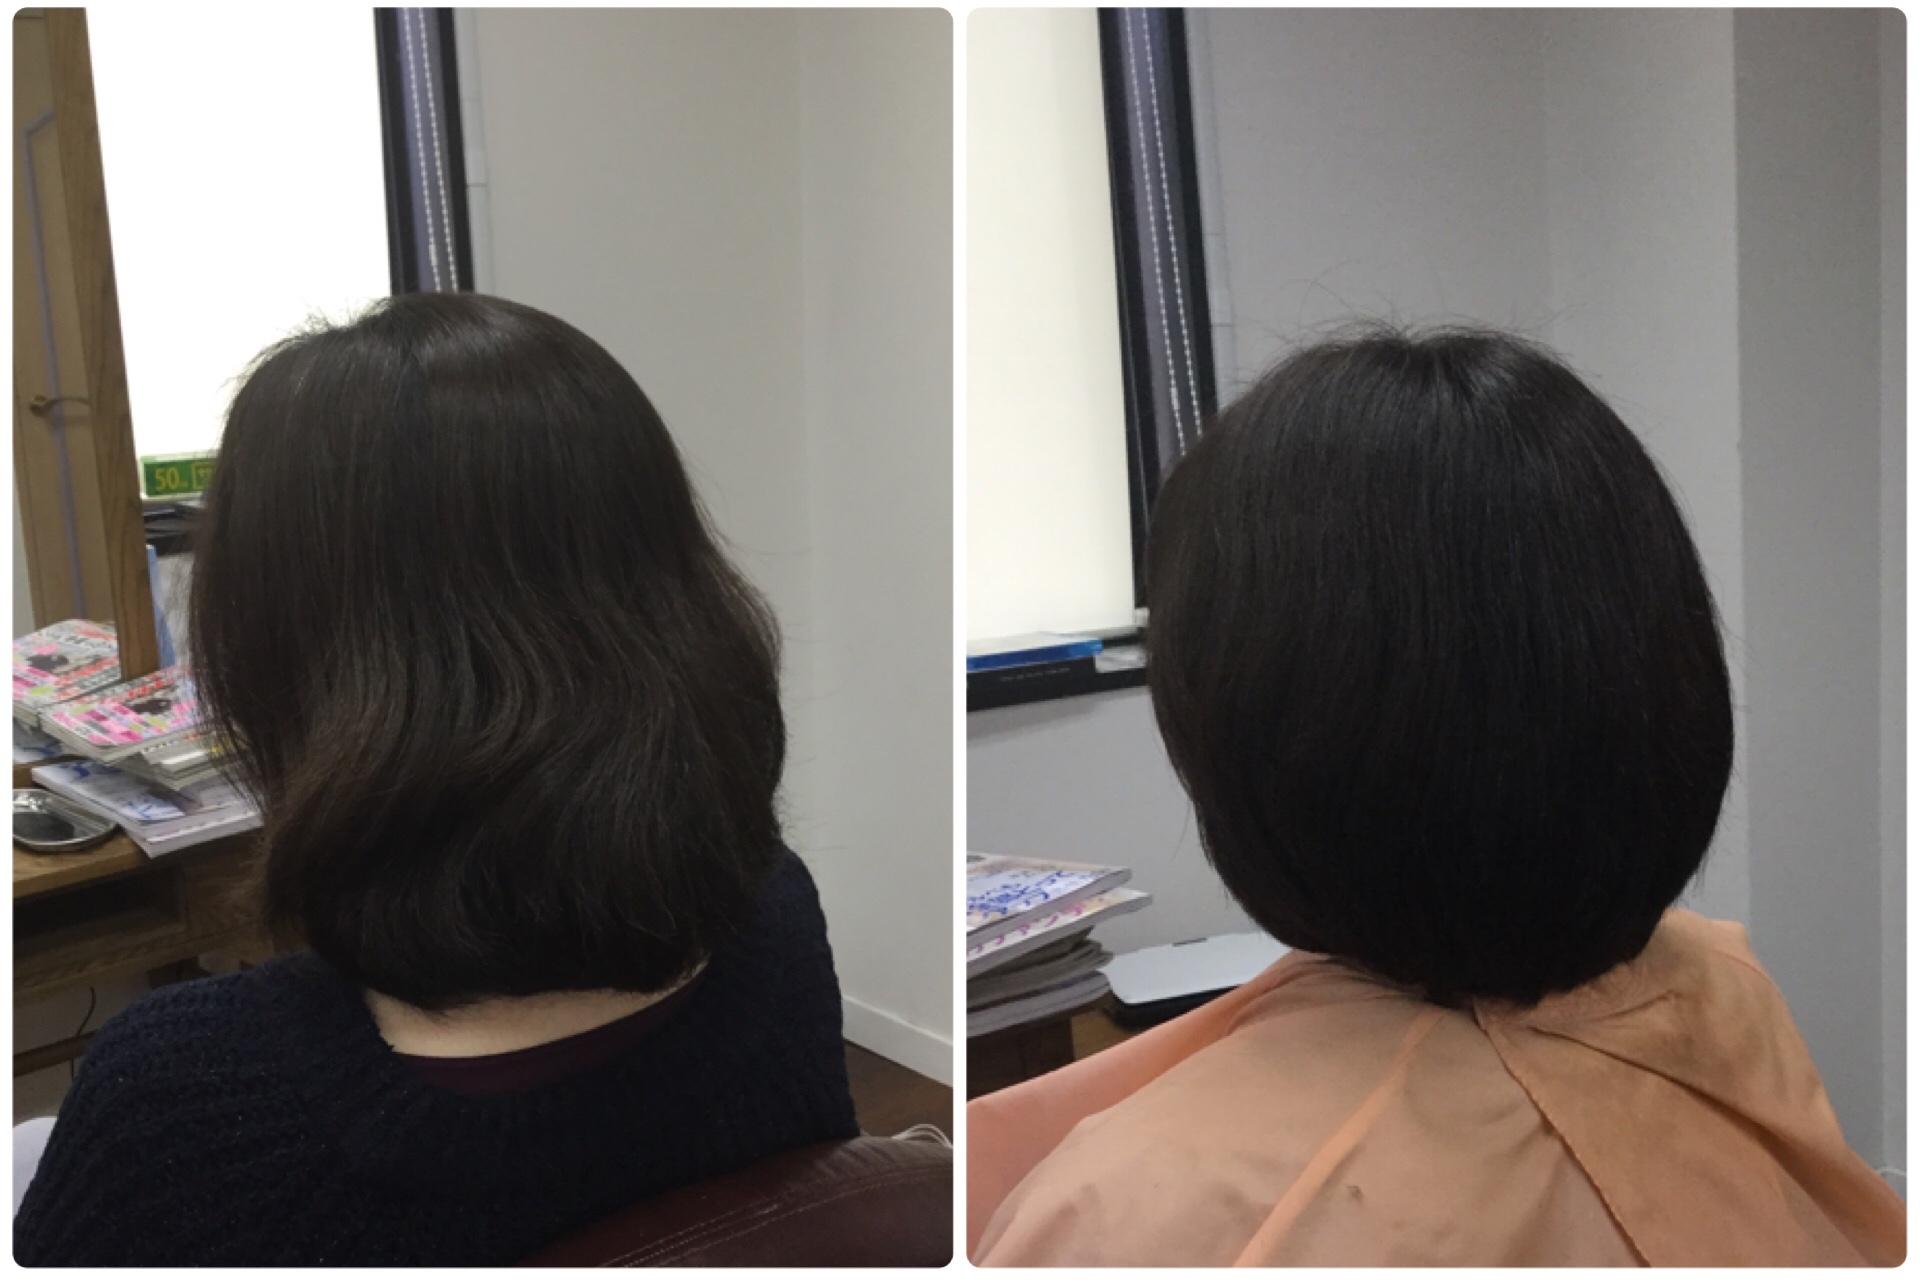 Iすきハサミで梳かれすぎ【おさまり・広がり・まとまり】の悩みに神戸岡本くせ毛専門美容室アバディ